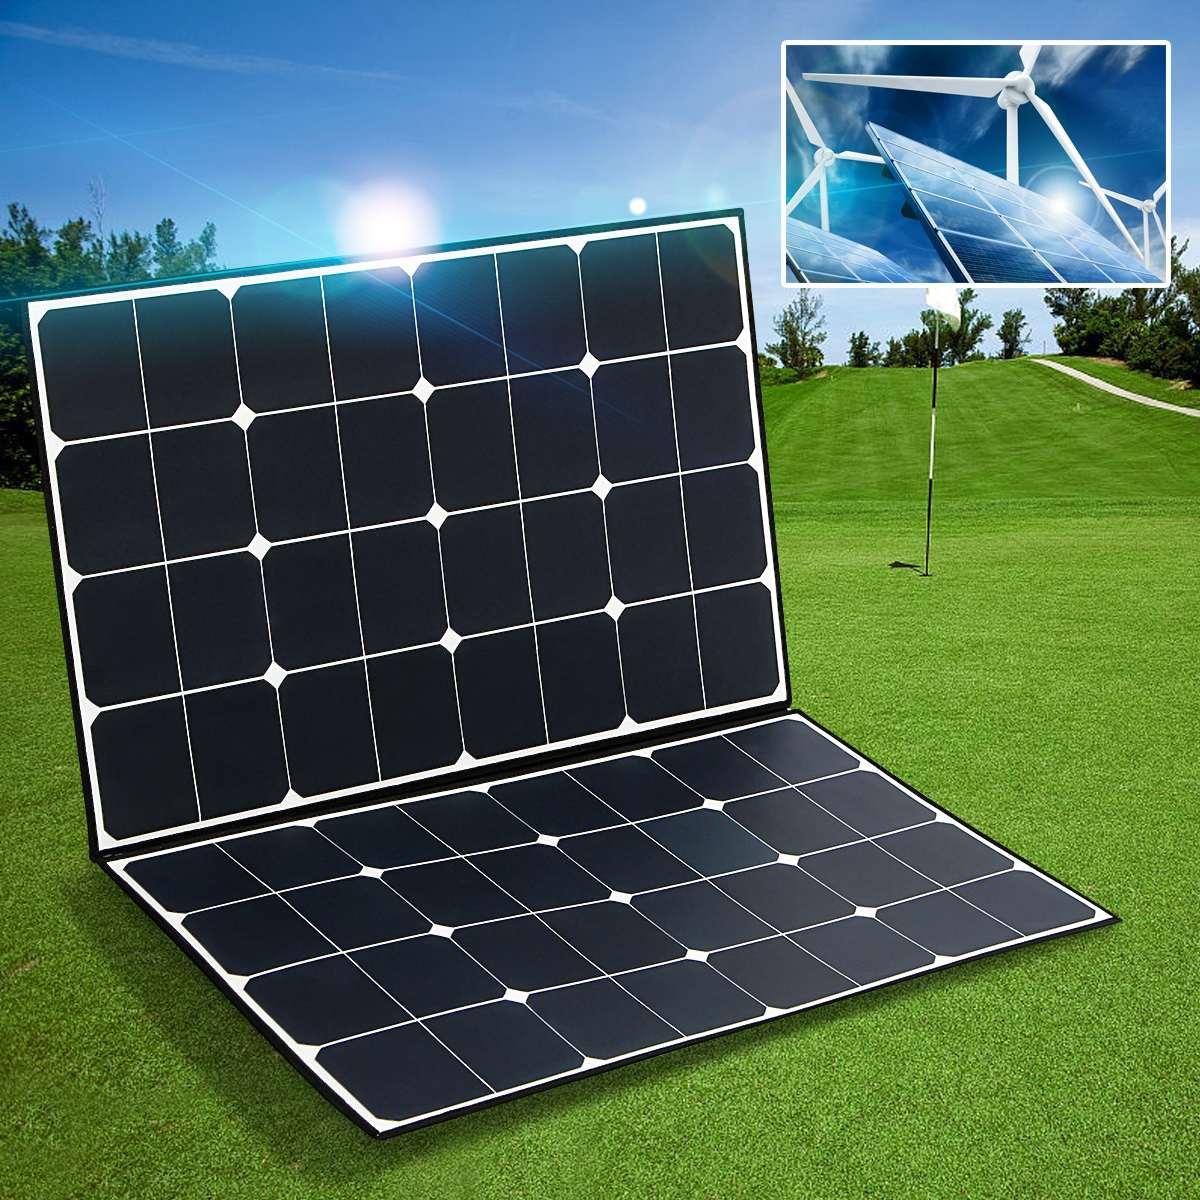 SP-22 Folding Zipper 160W 18V Semi Flexible Monocrystalline Solar Panel High Conversion Efficiency + one-to-two MC4 connector